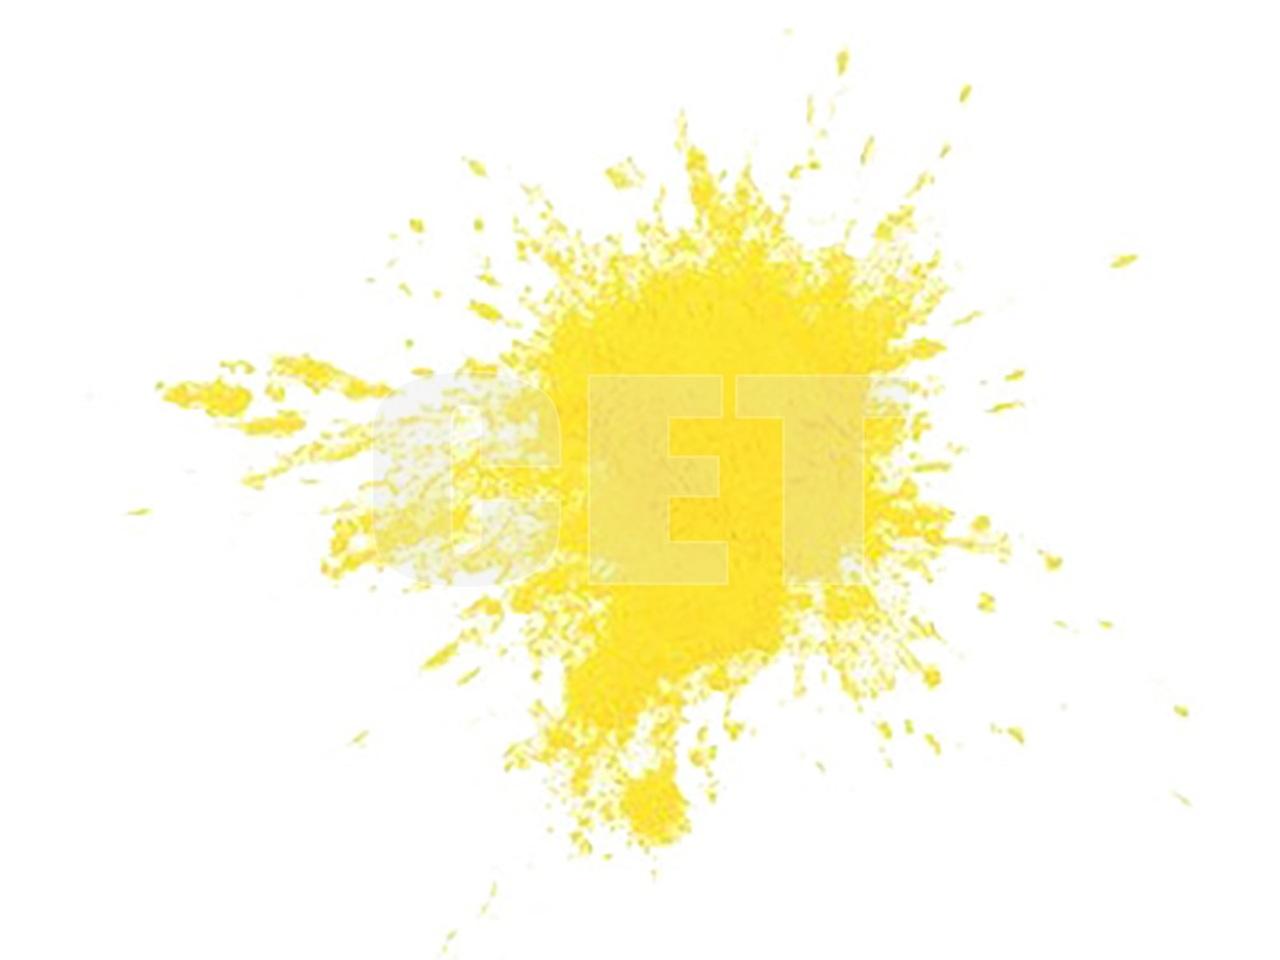 Тонер HT8-Y (CPT) для RICOH MPC2003/2503/3003/5503(Japan) Yellow, 20кг/мешок, (унив.), CET8524Y